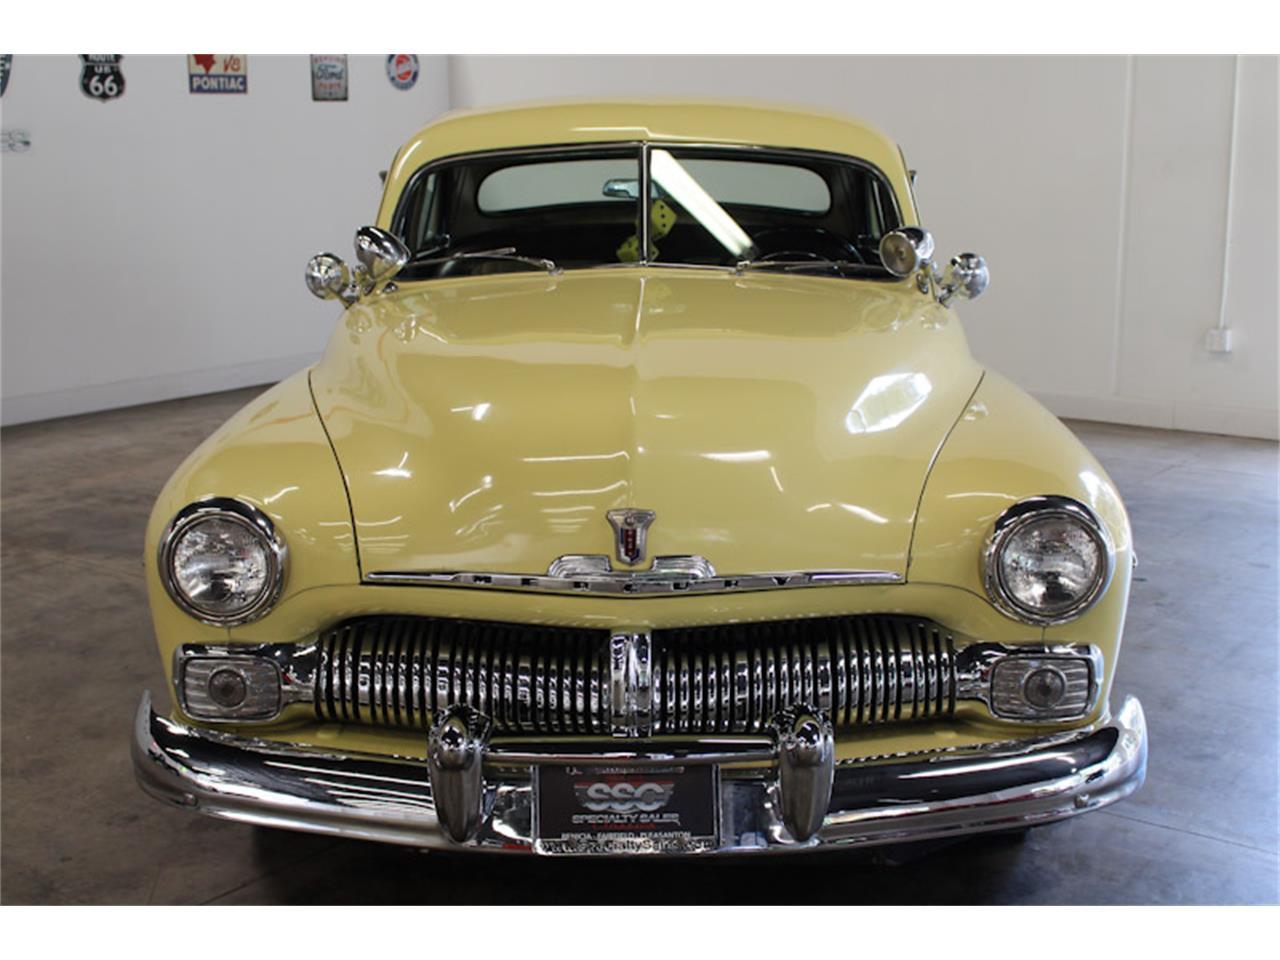 Large Picture of Classic 1950 Mercury Hot Rod - $29,990.00 - OJFQ